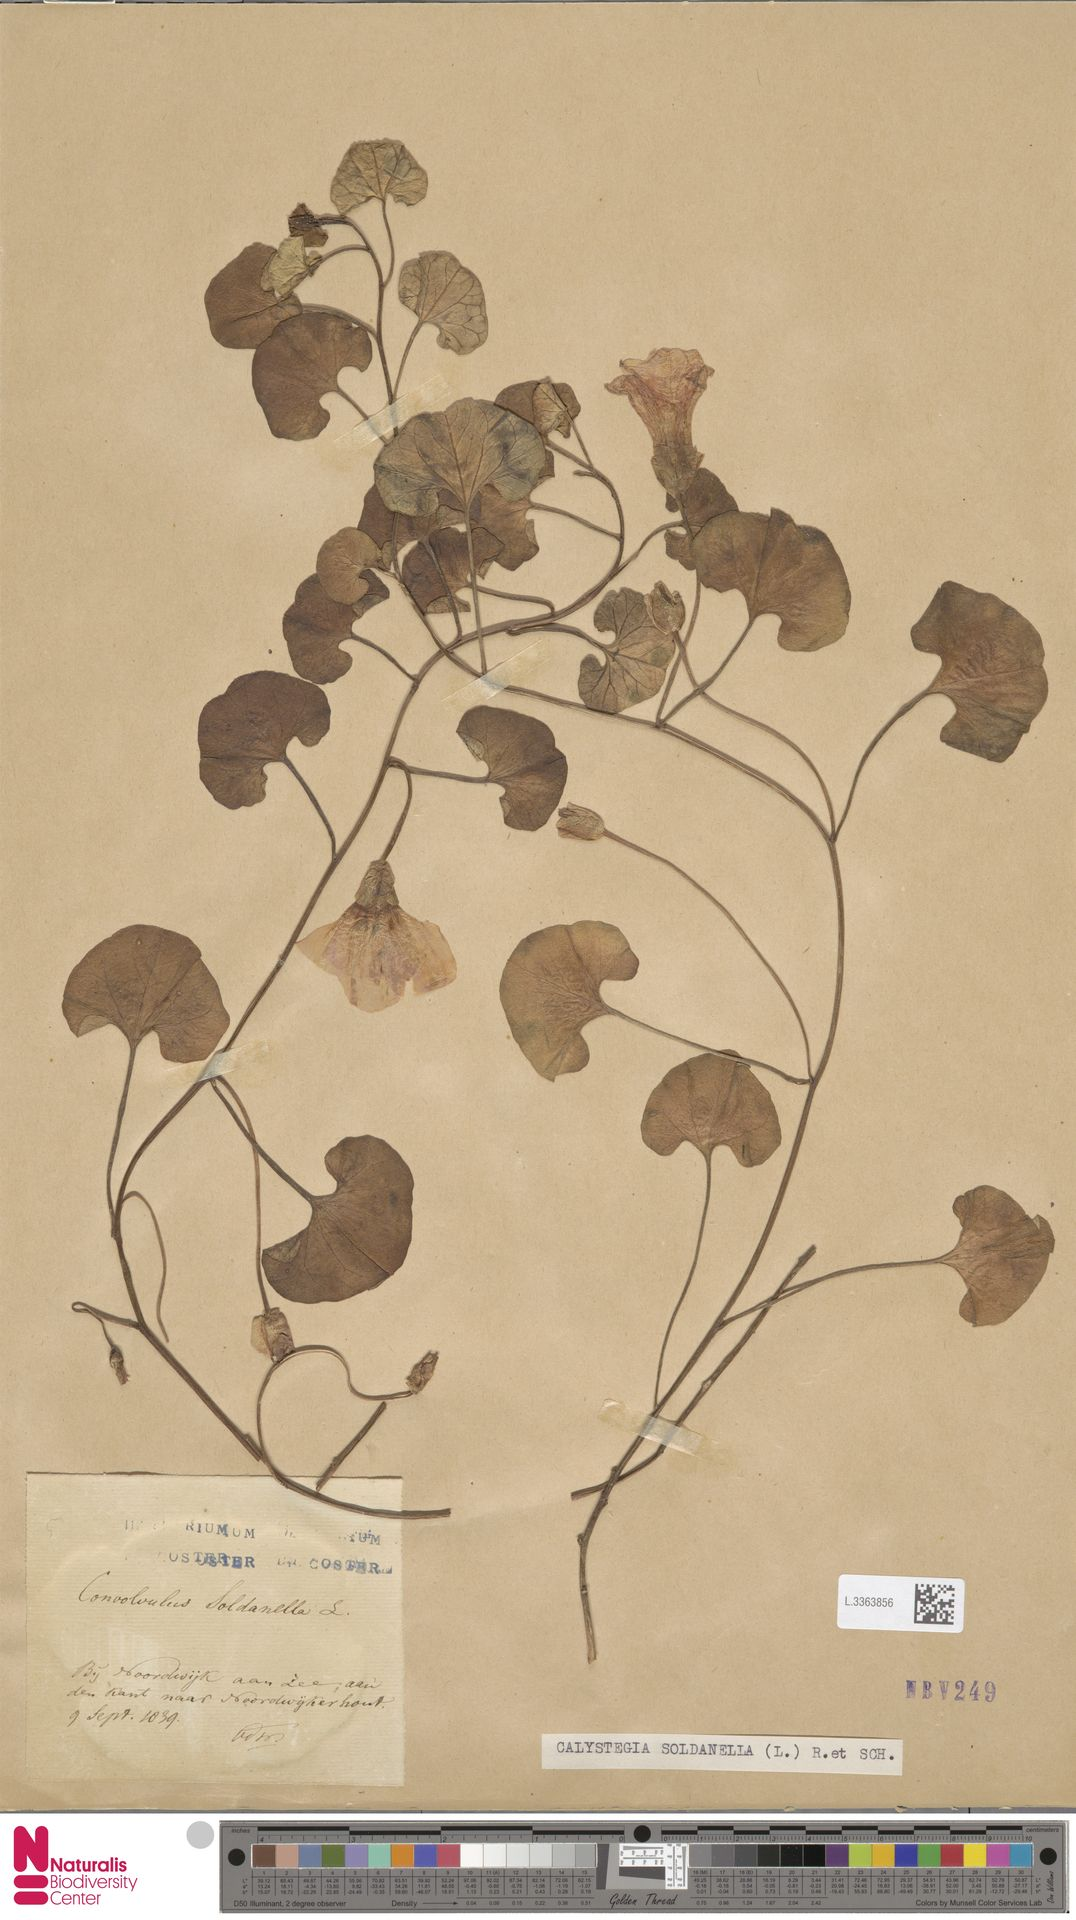 L.3363856   Calystegia soldanella (L.) R.Br.